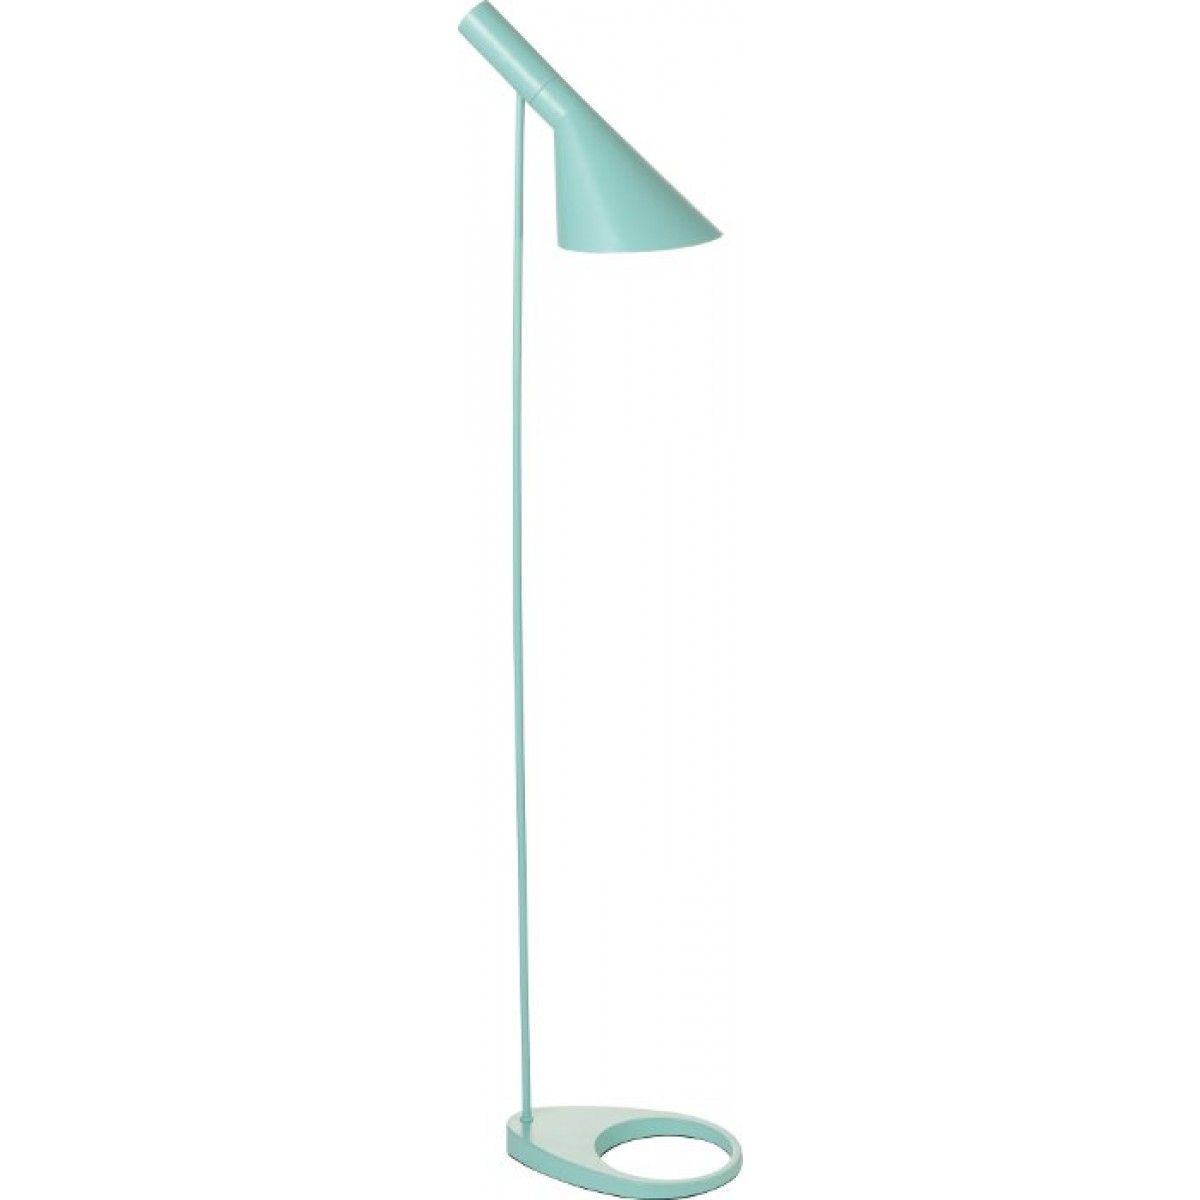 Aj stehlampe jacobsen designerlampen voga living in replica aj floor lamp inspired by arne jacobsen designed for the royal hotel in 1960 adjustable shade and glarefree light availabe in several colours part aloadofball Images